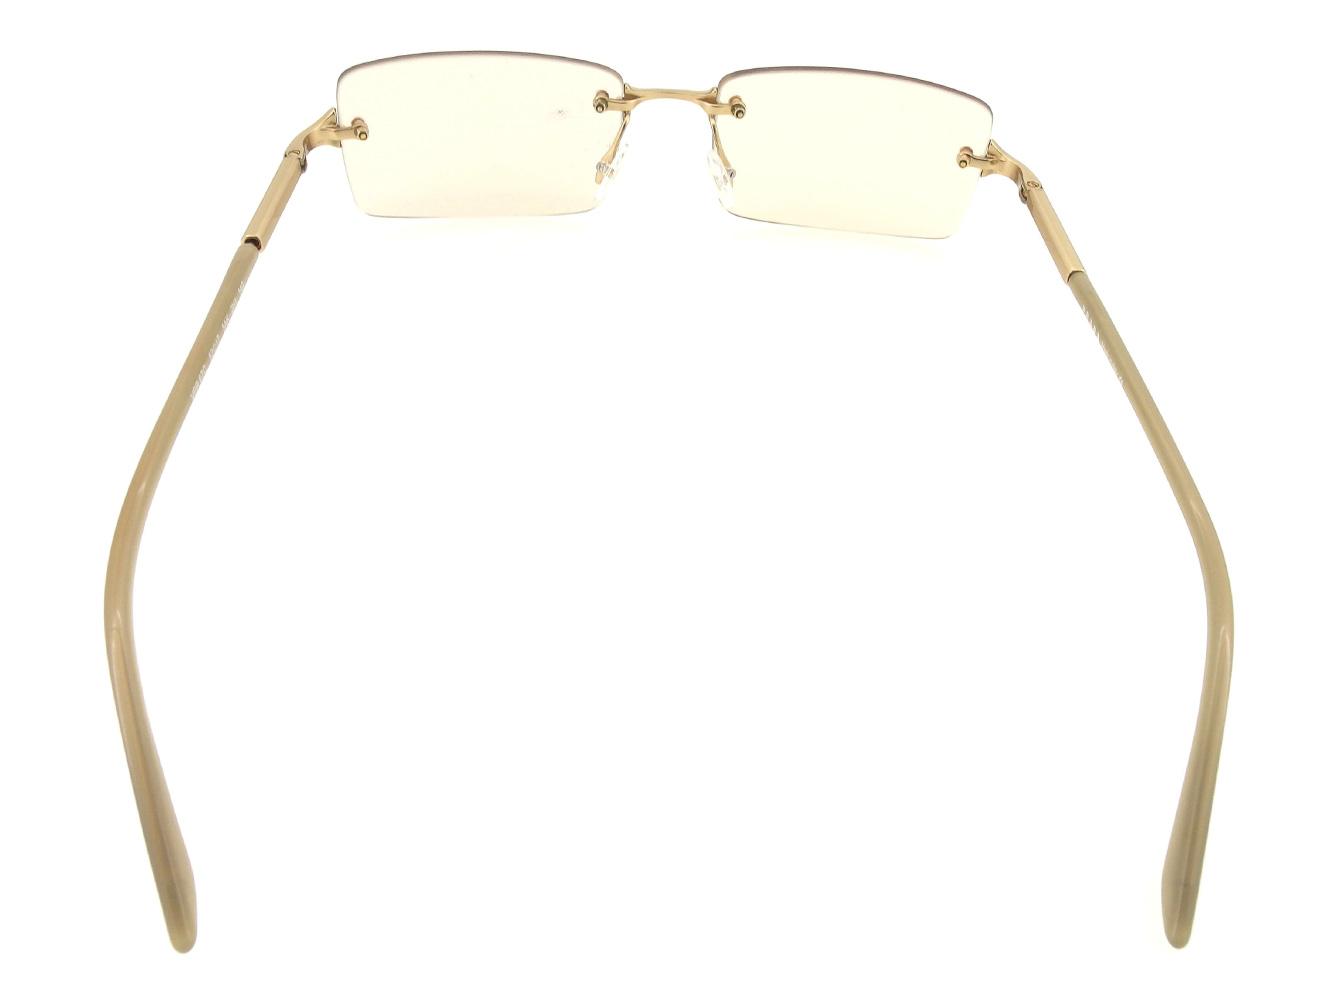 a3f631f52d Prada PRADA sunglasses eyeware Lady s men brown gold popularity sale L2510